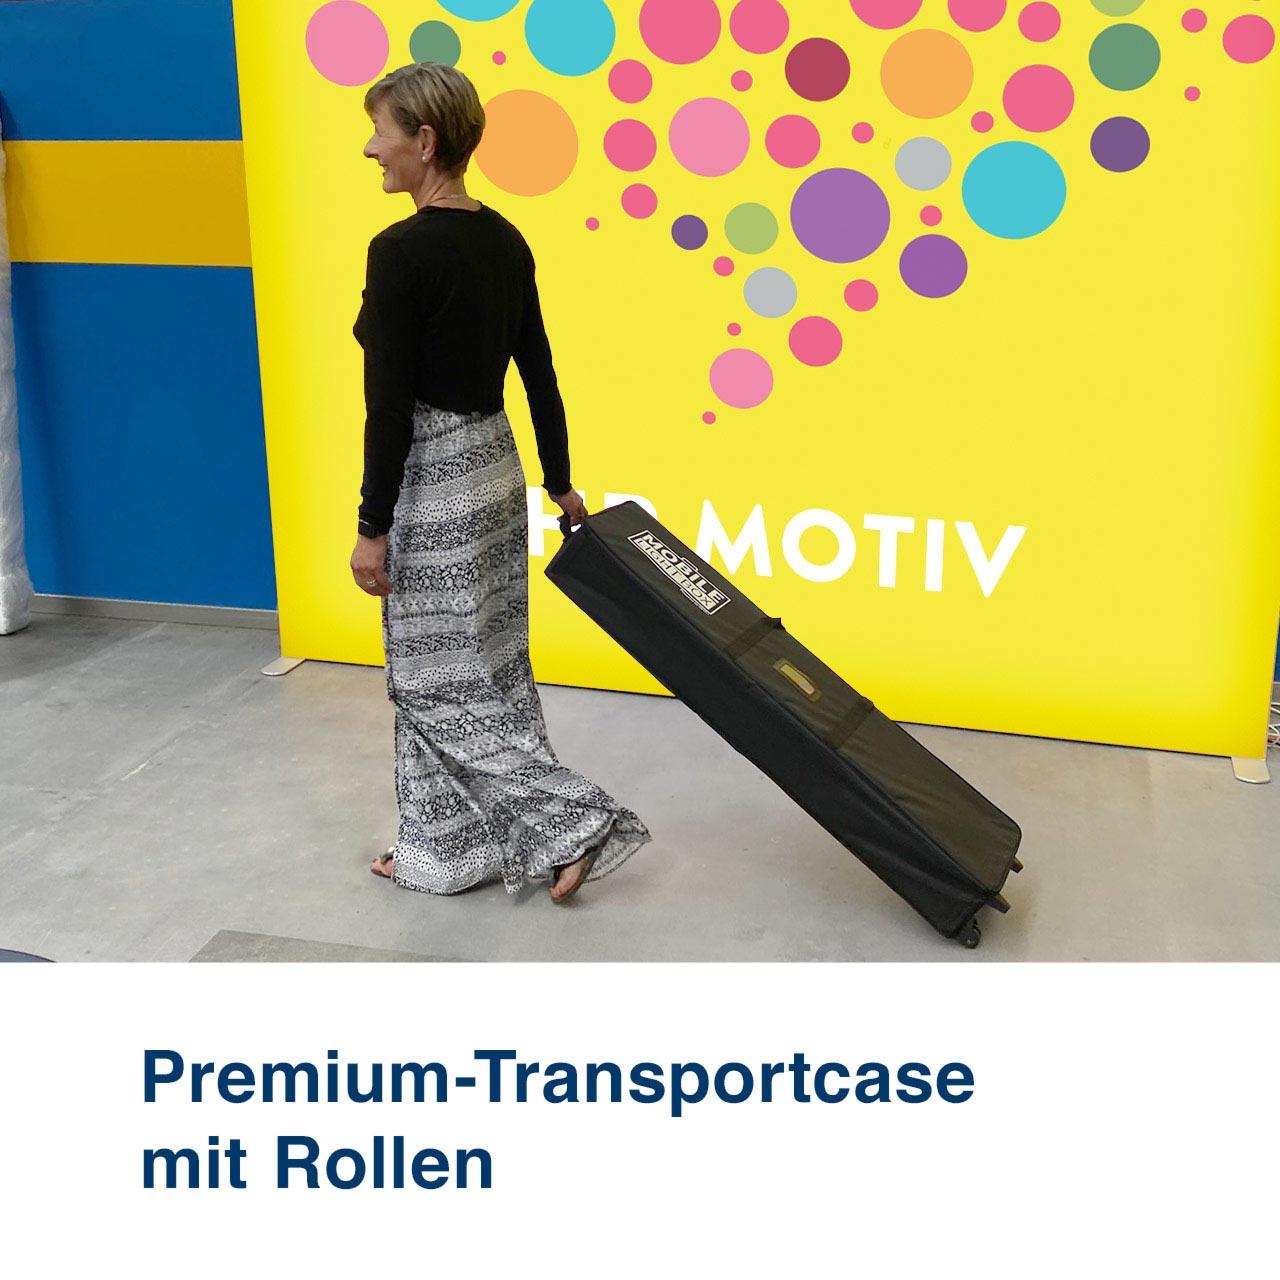 Mobile Light Box Transportcase Premium mit Rollen